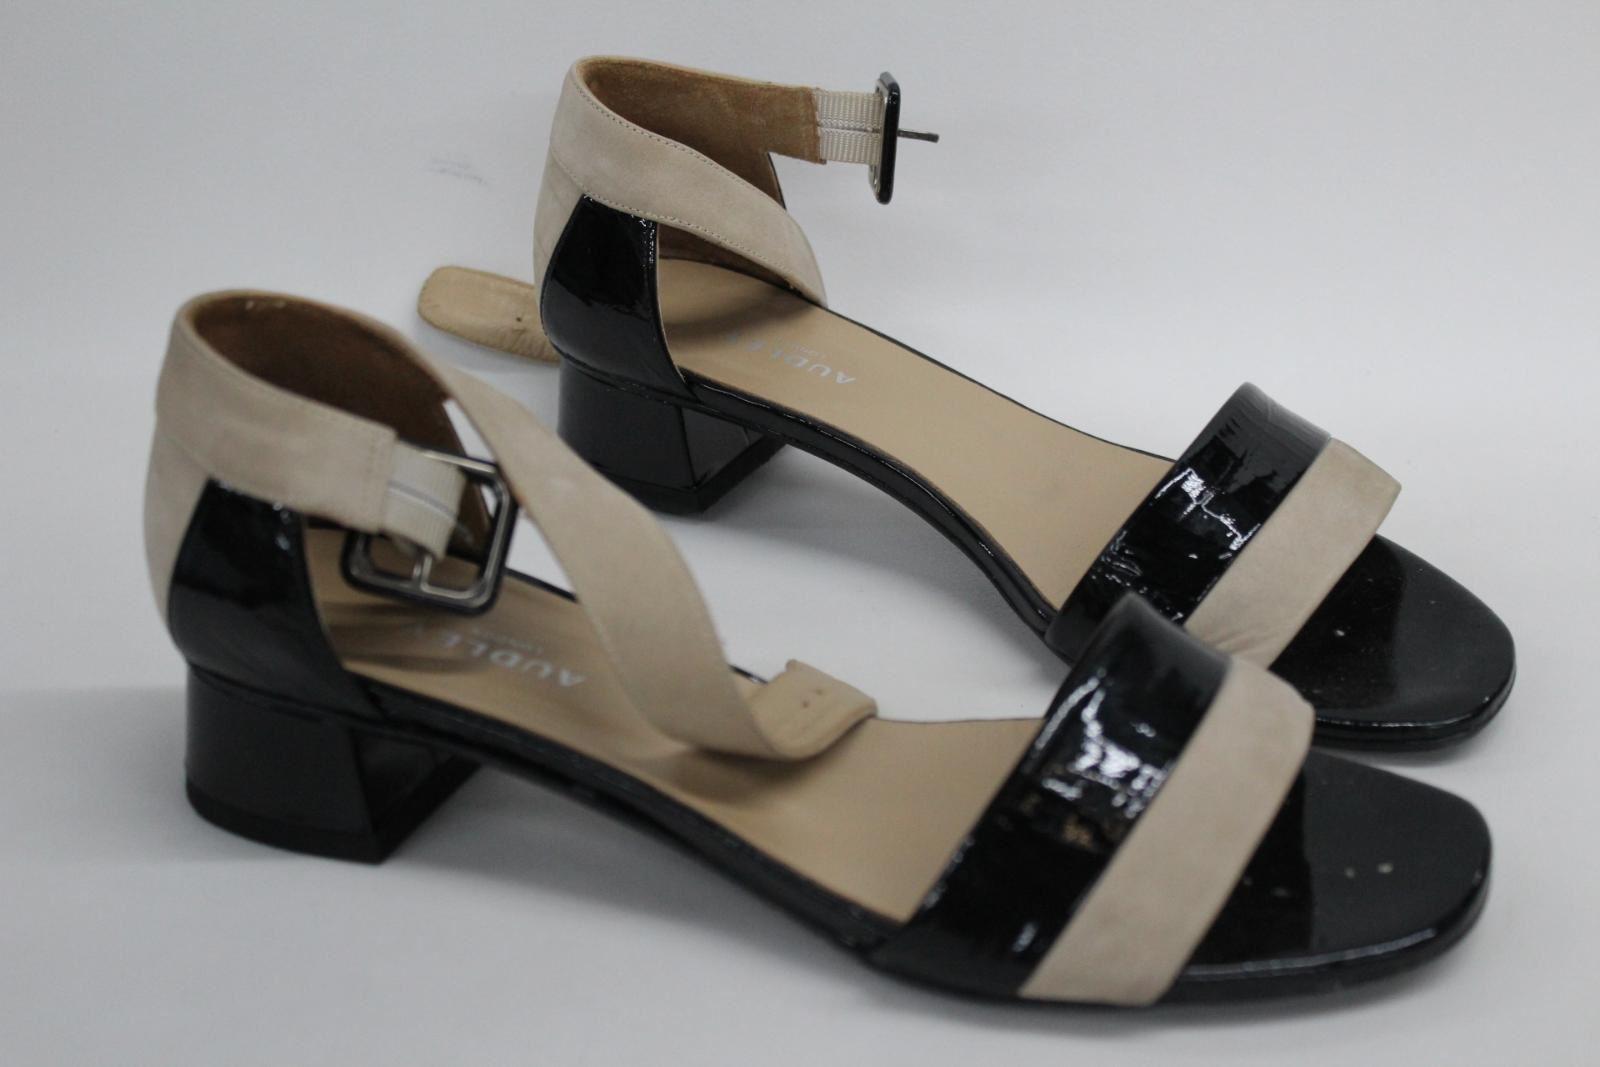 AUDLEY-London-Ladies-Black-amp-Beige-Ankle-Strap-Mid-Heel-Sandal-Shoes-EU39-UK6